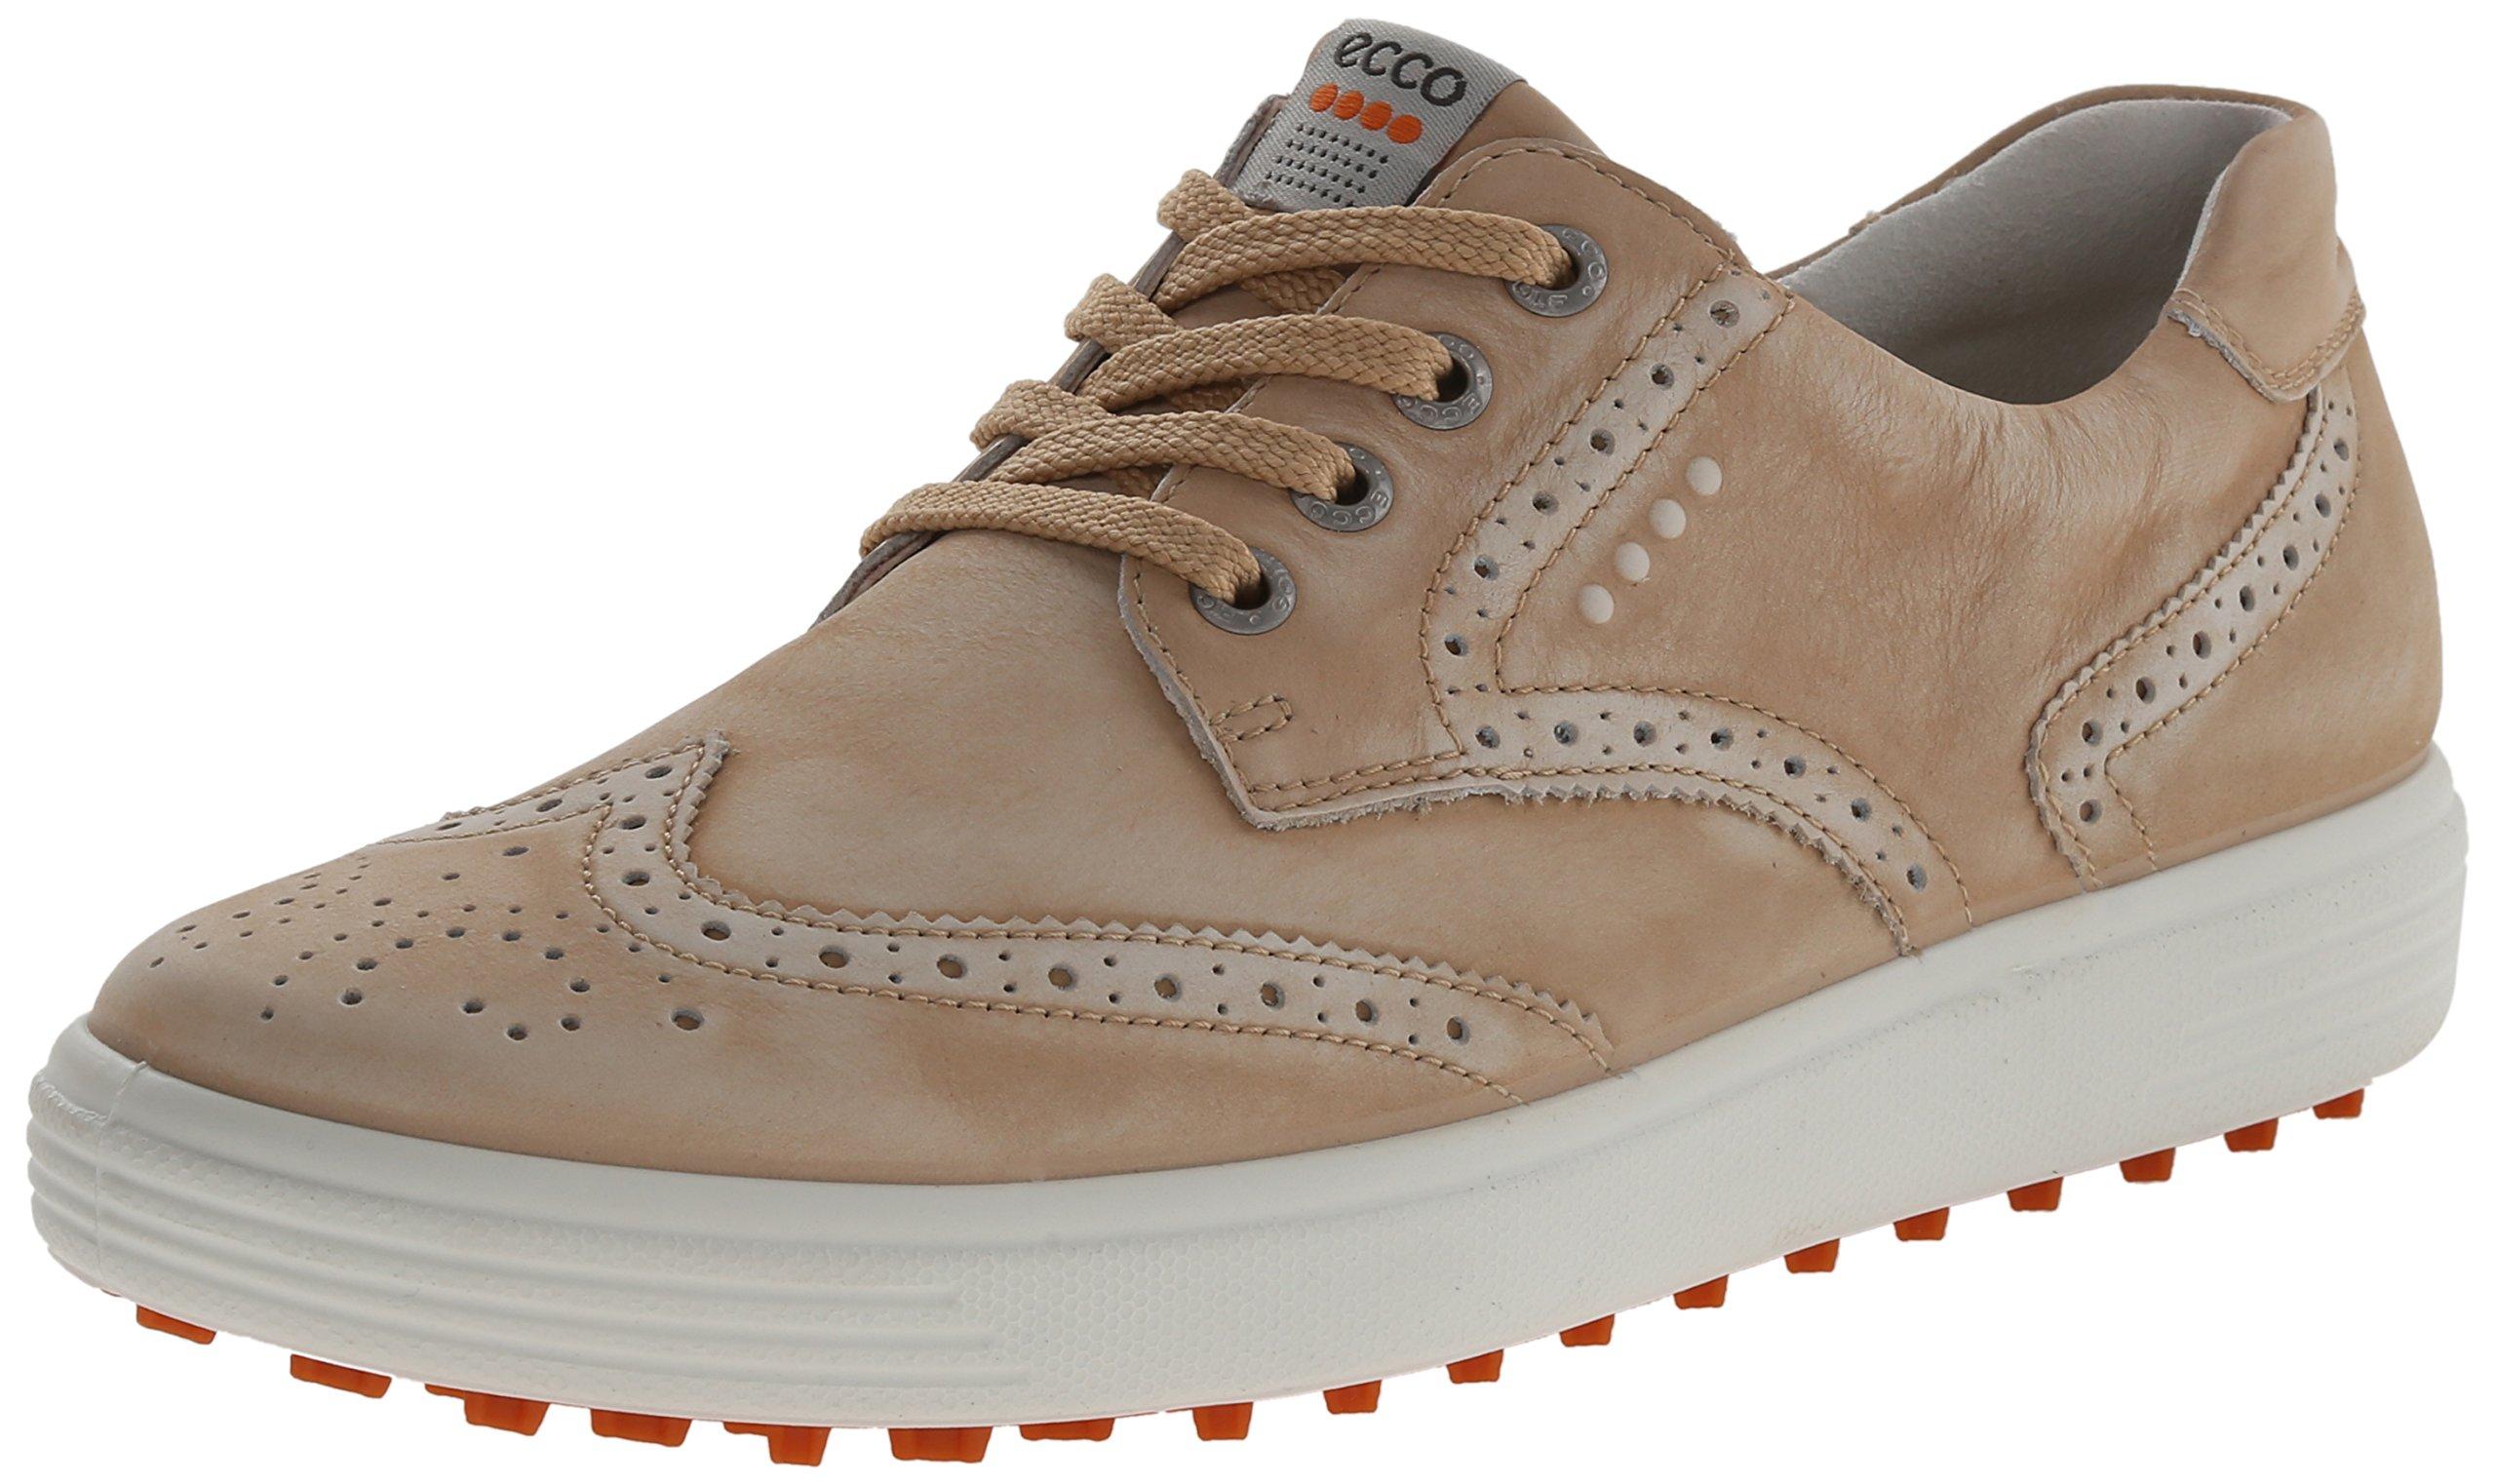 ECCO Women's Casual Hybrid Golf Shoe, Sesame, 36 EU/5-5.5 M US by ECCO